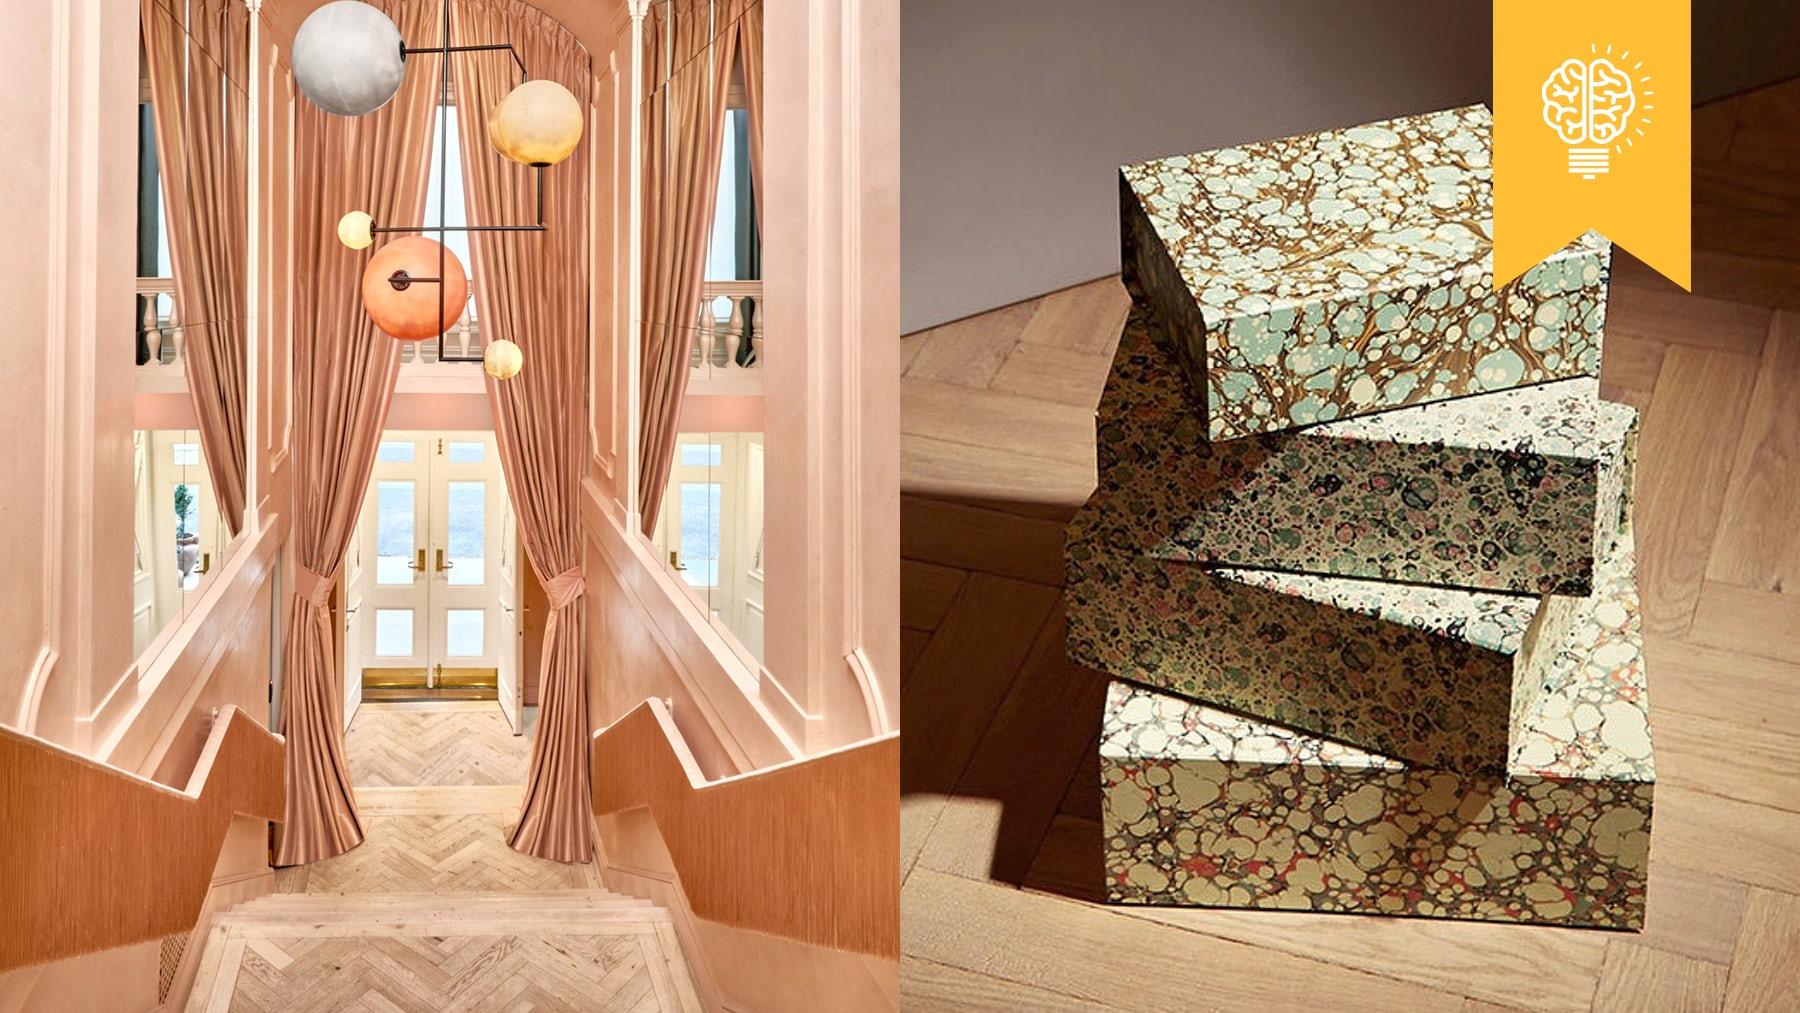 Moda Operandi's New York showroom, Matches Fashion's e-commerce packaging | Source: Courtesy